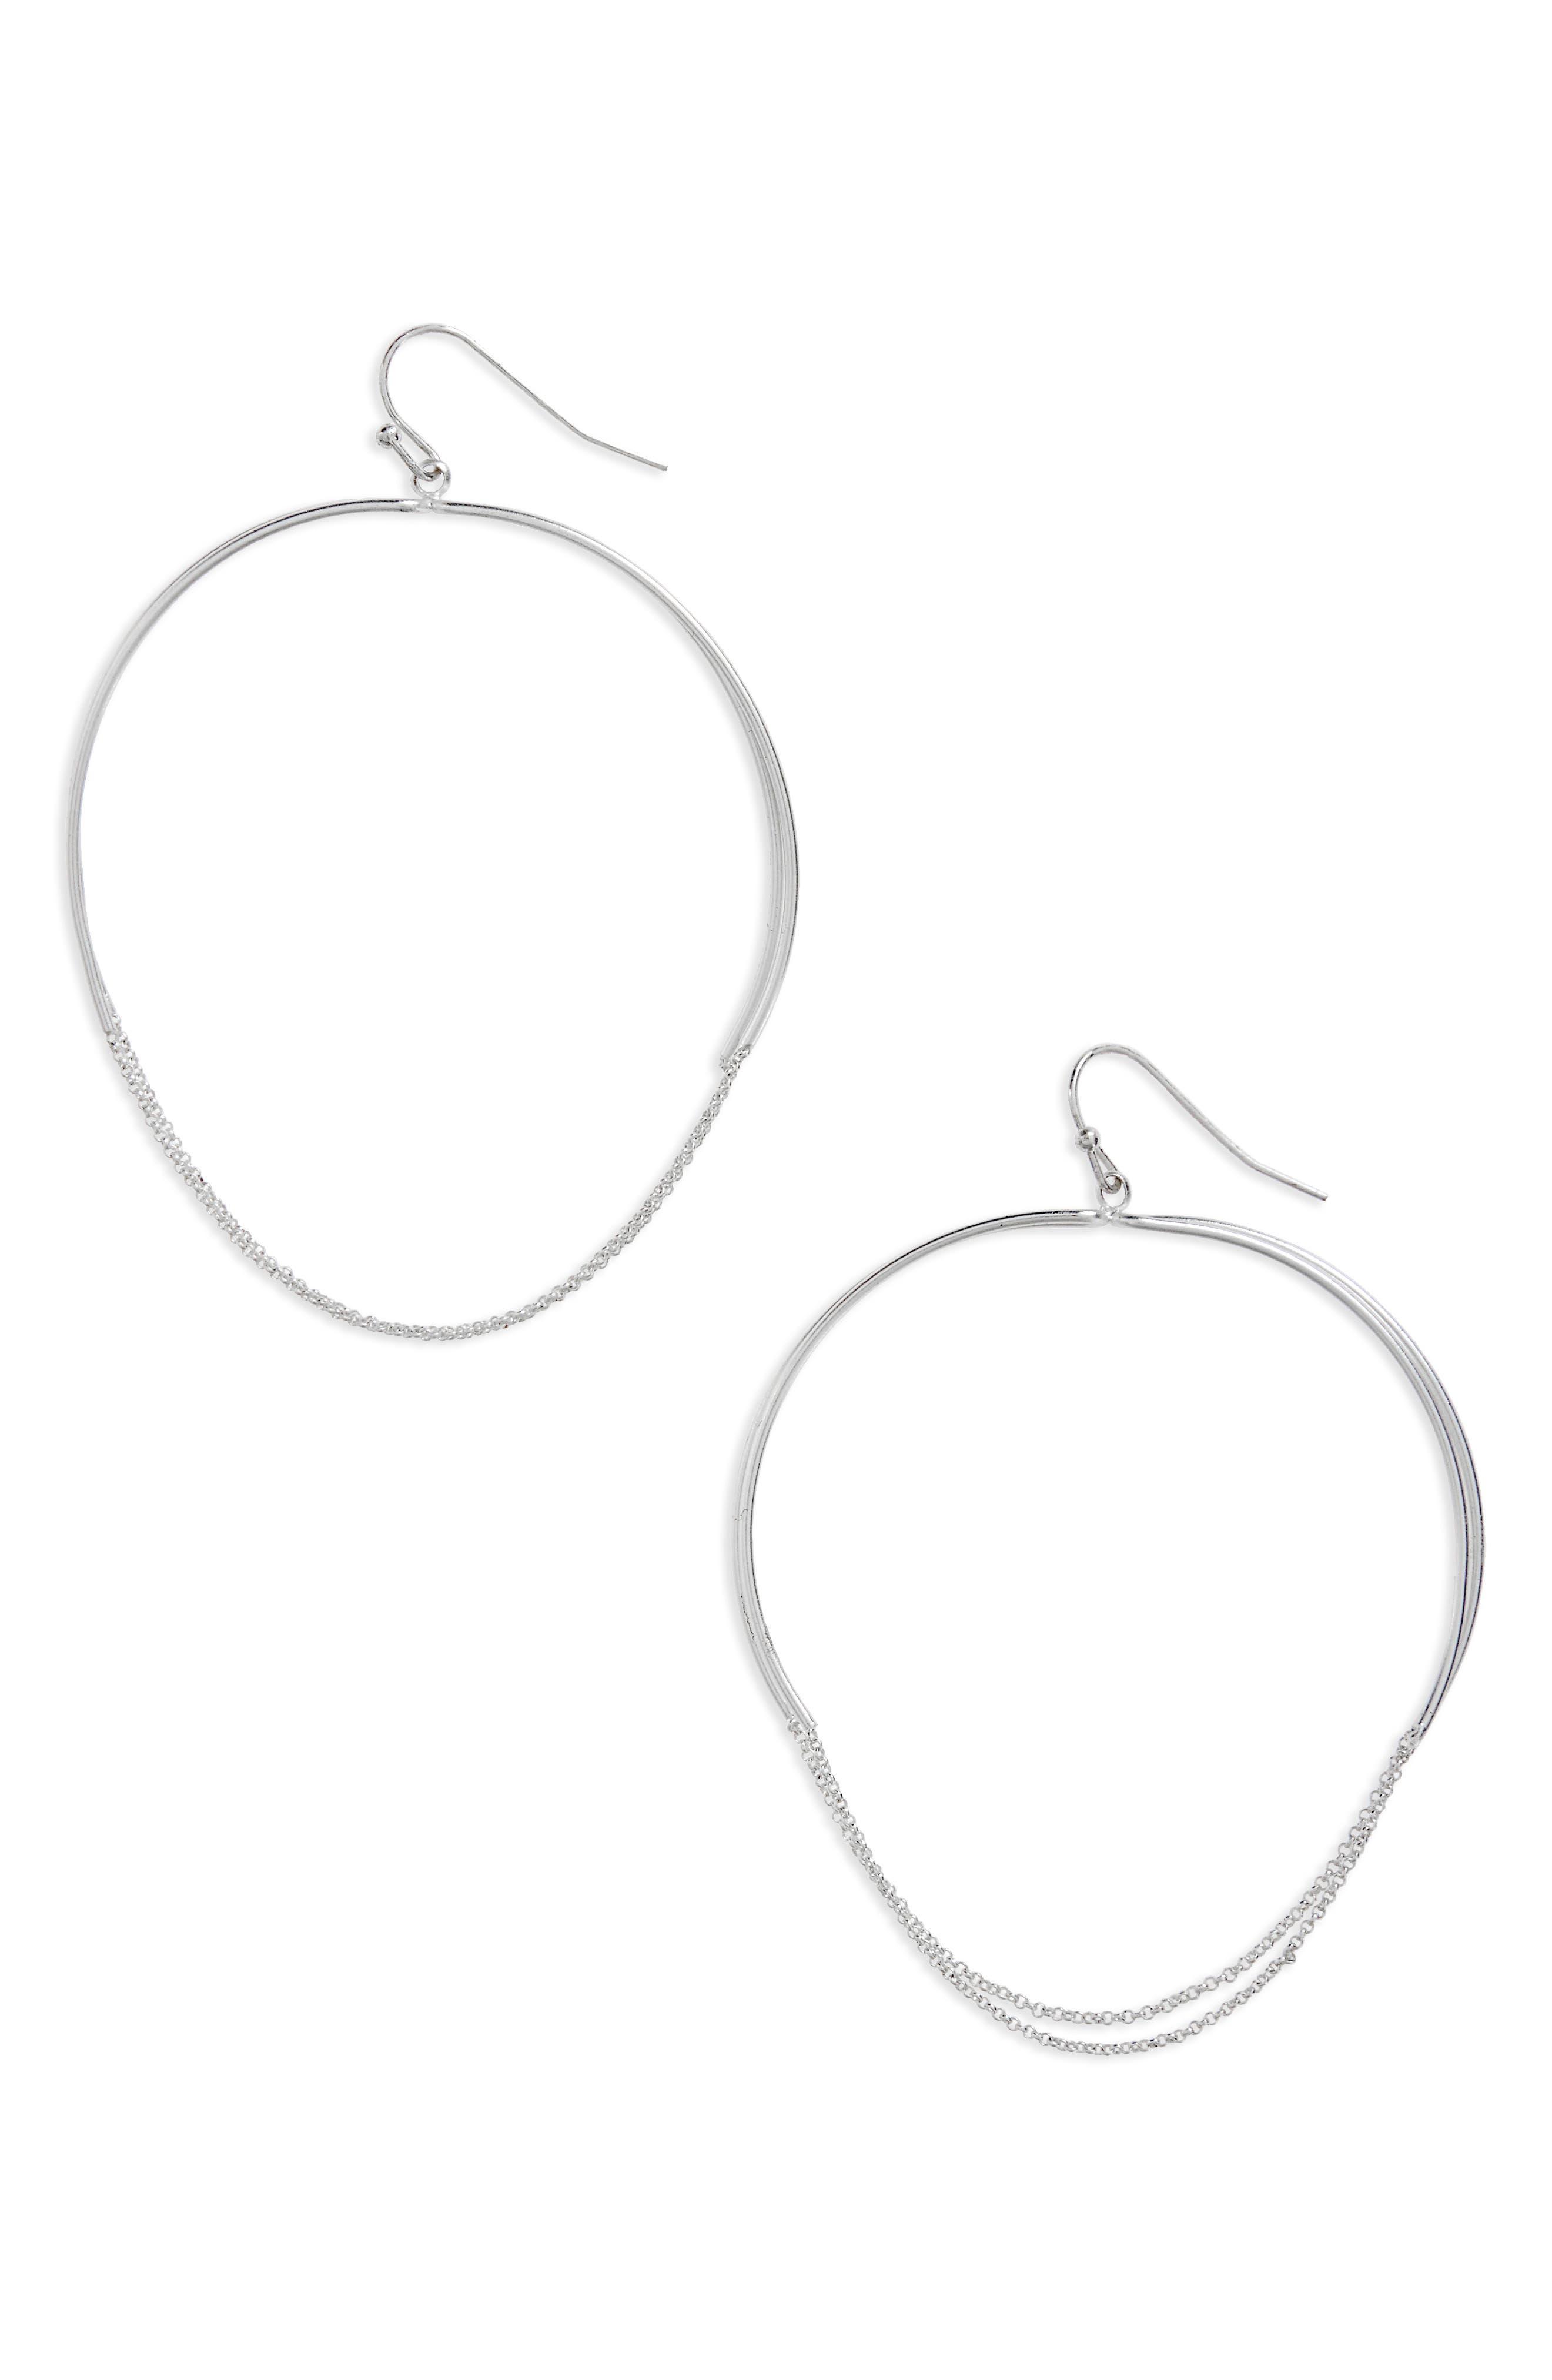 Large Chain Detail Hoop Earrings,                         Main,                         color, SILVER